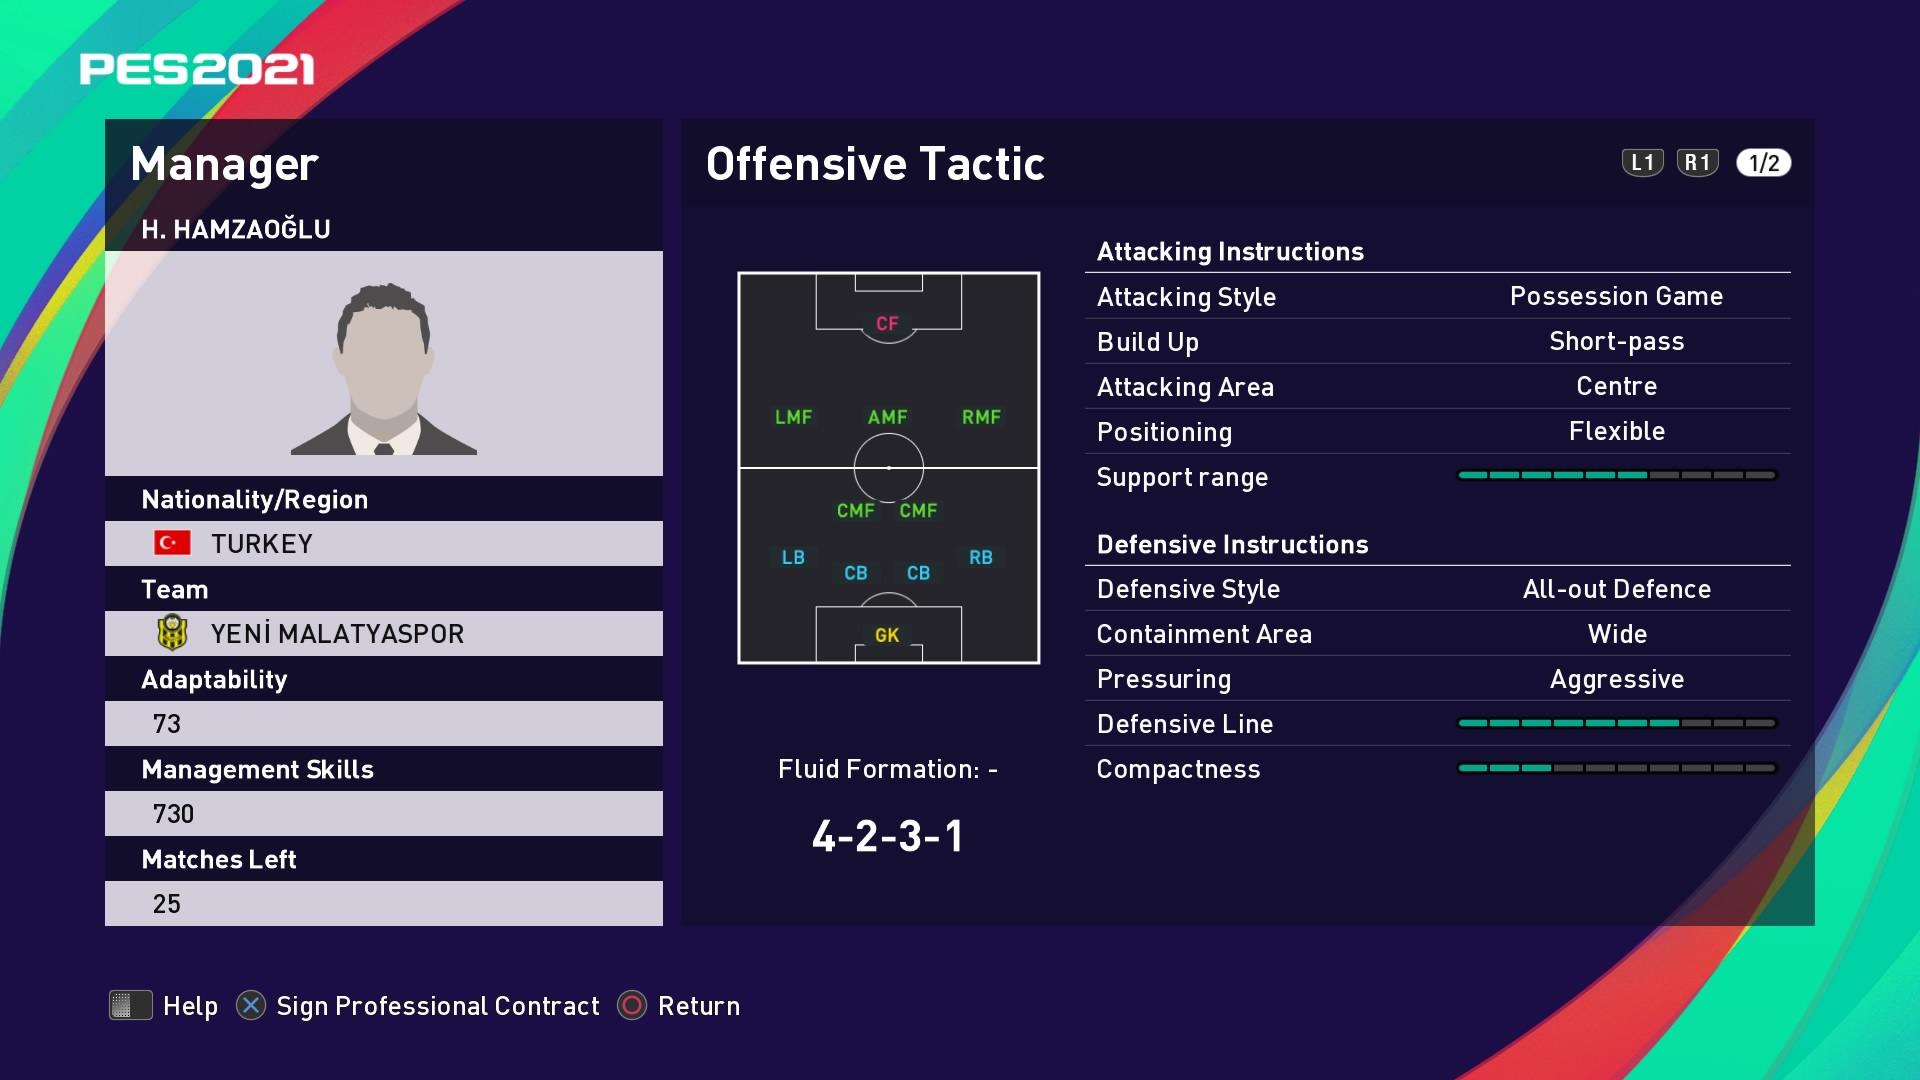 H. Hamzaoğlu (Hamza Hamzaoğlu) Offensive Tactic in PES 2021 myClub